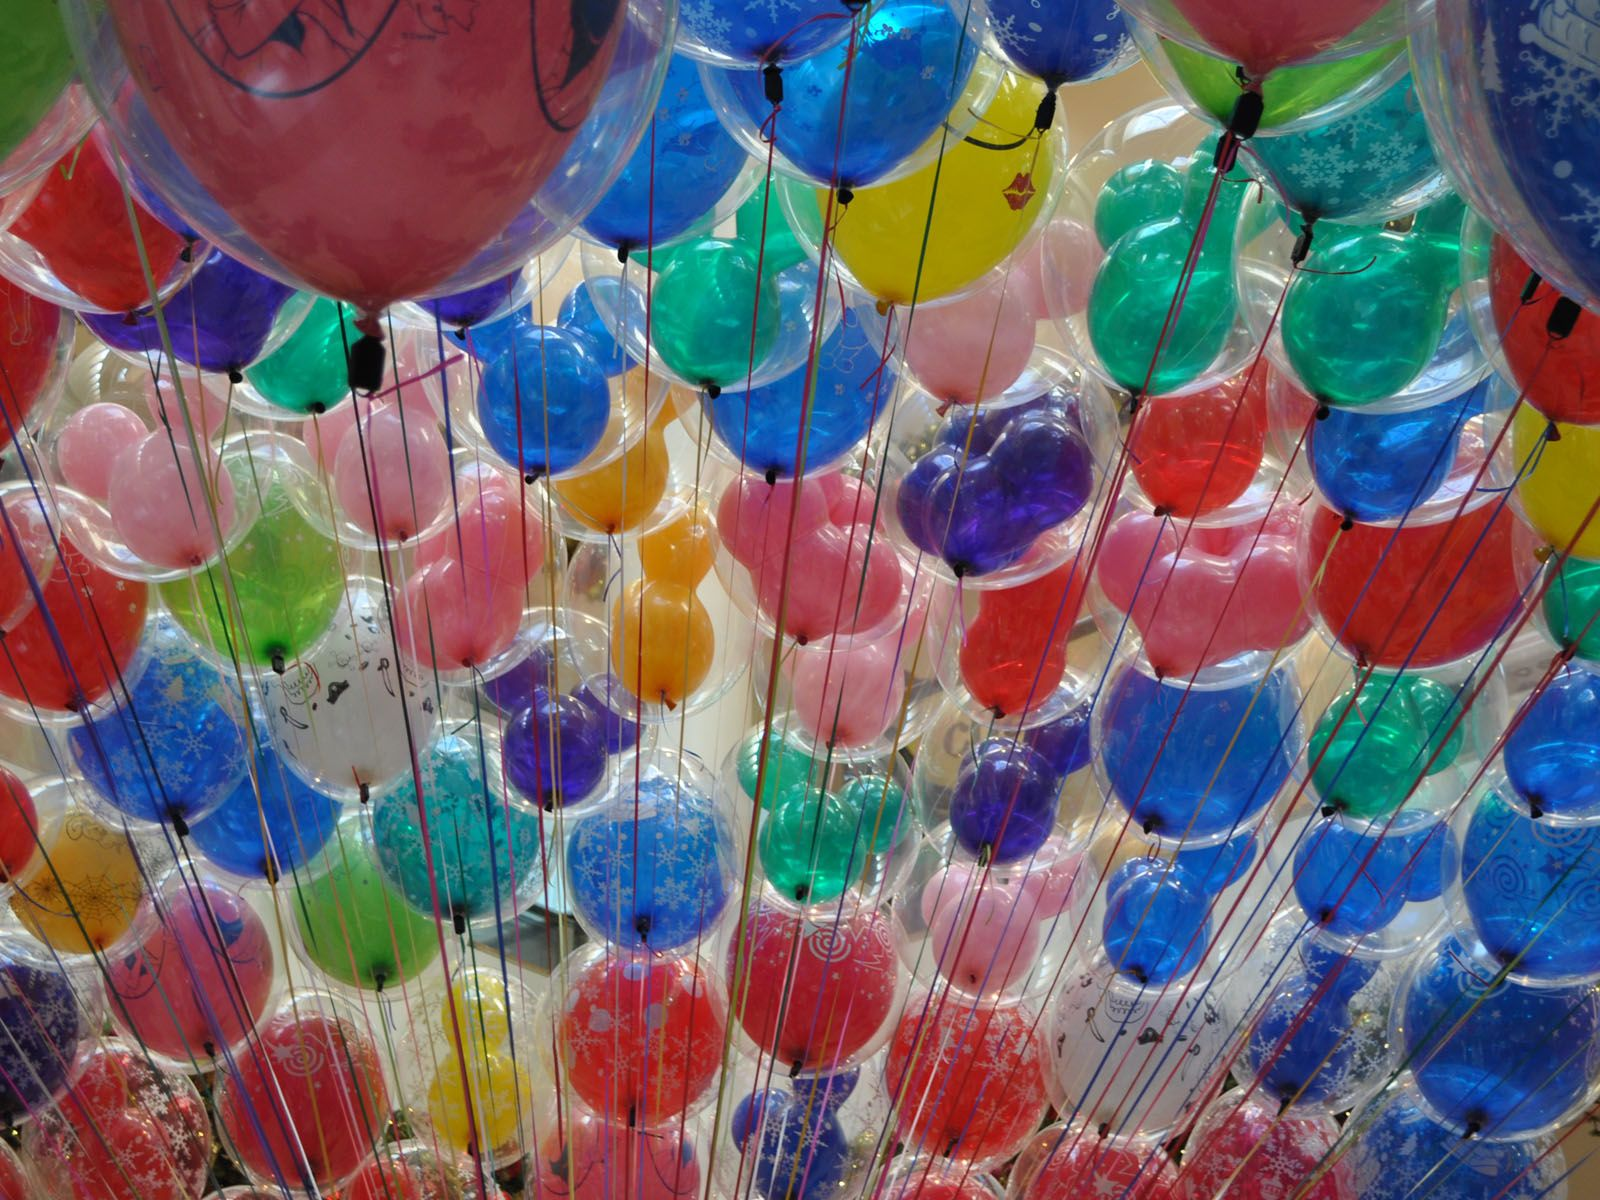 balloon wallpaper jpg balloon wallpaper 20 jpg wallpapers balloons 1600x1200